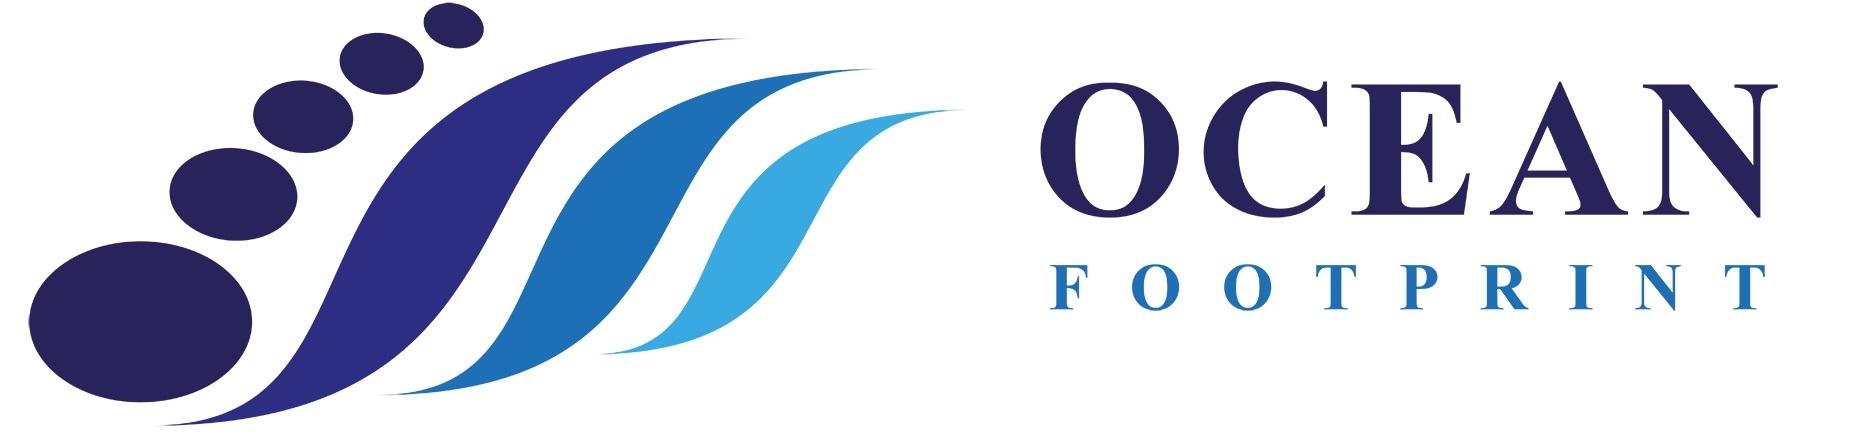 Peter Harrison – Ocean Footprint Ltd